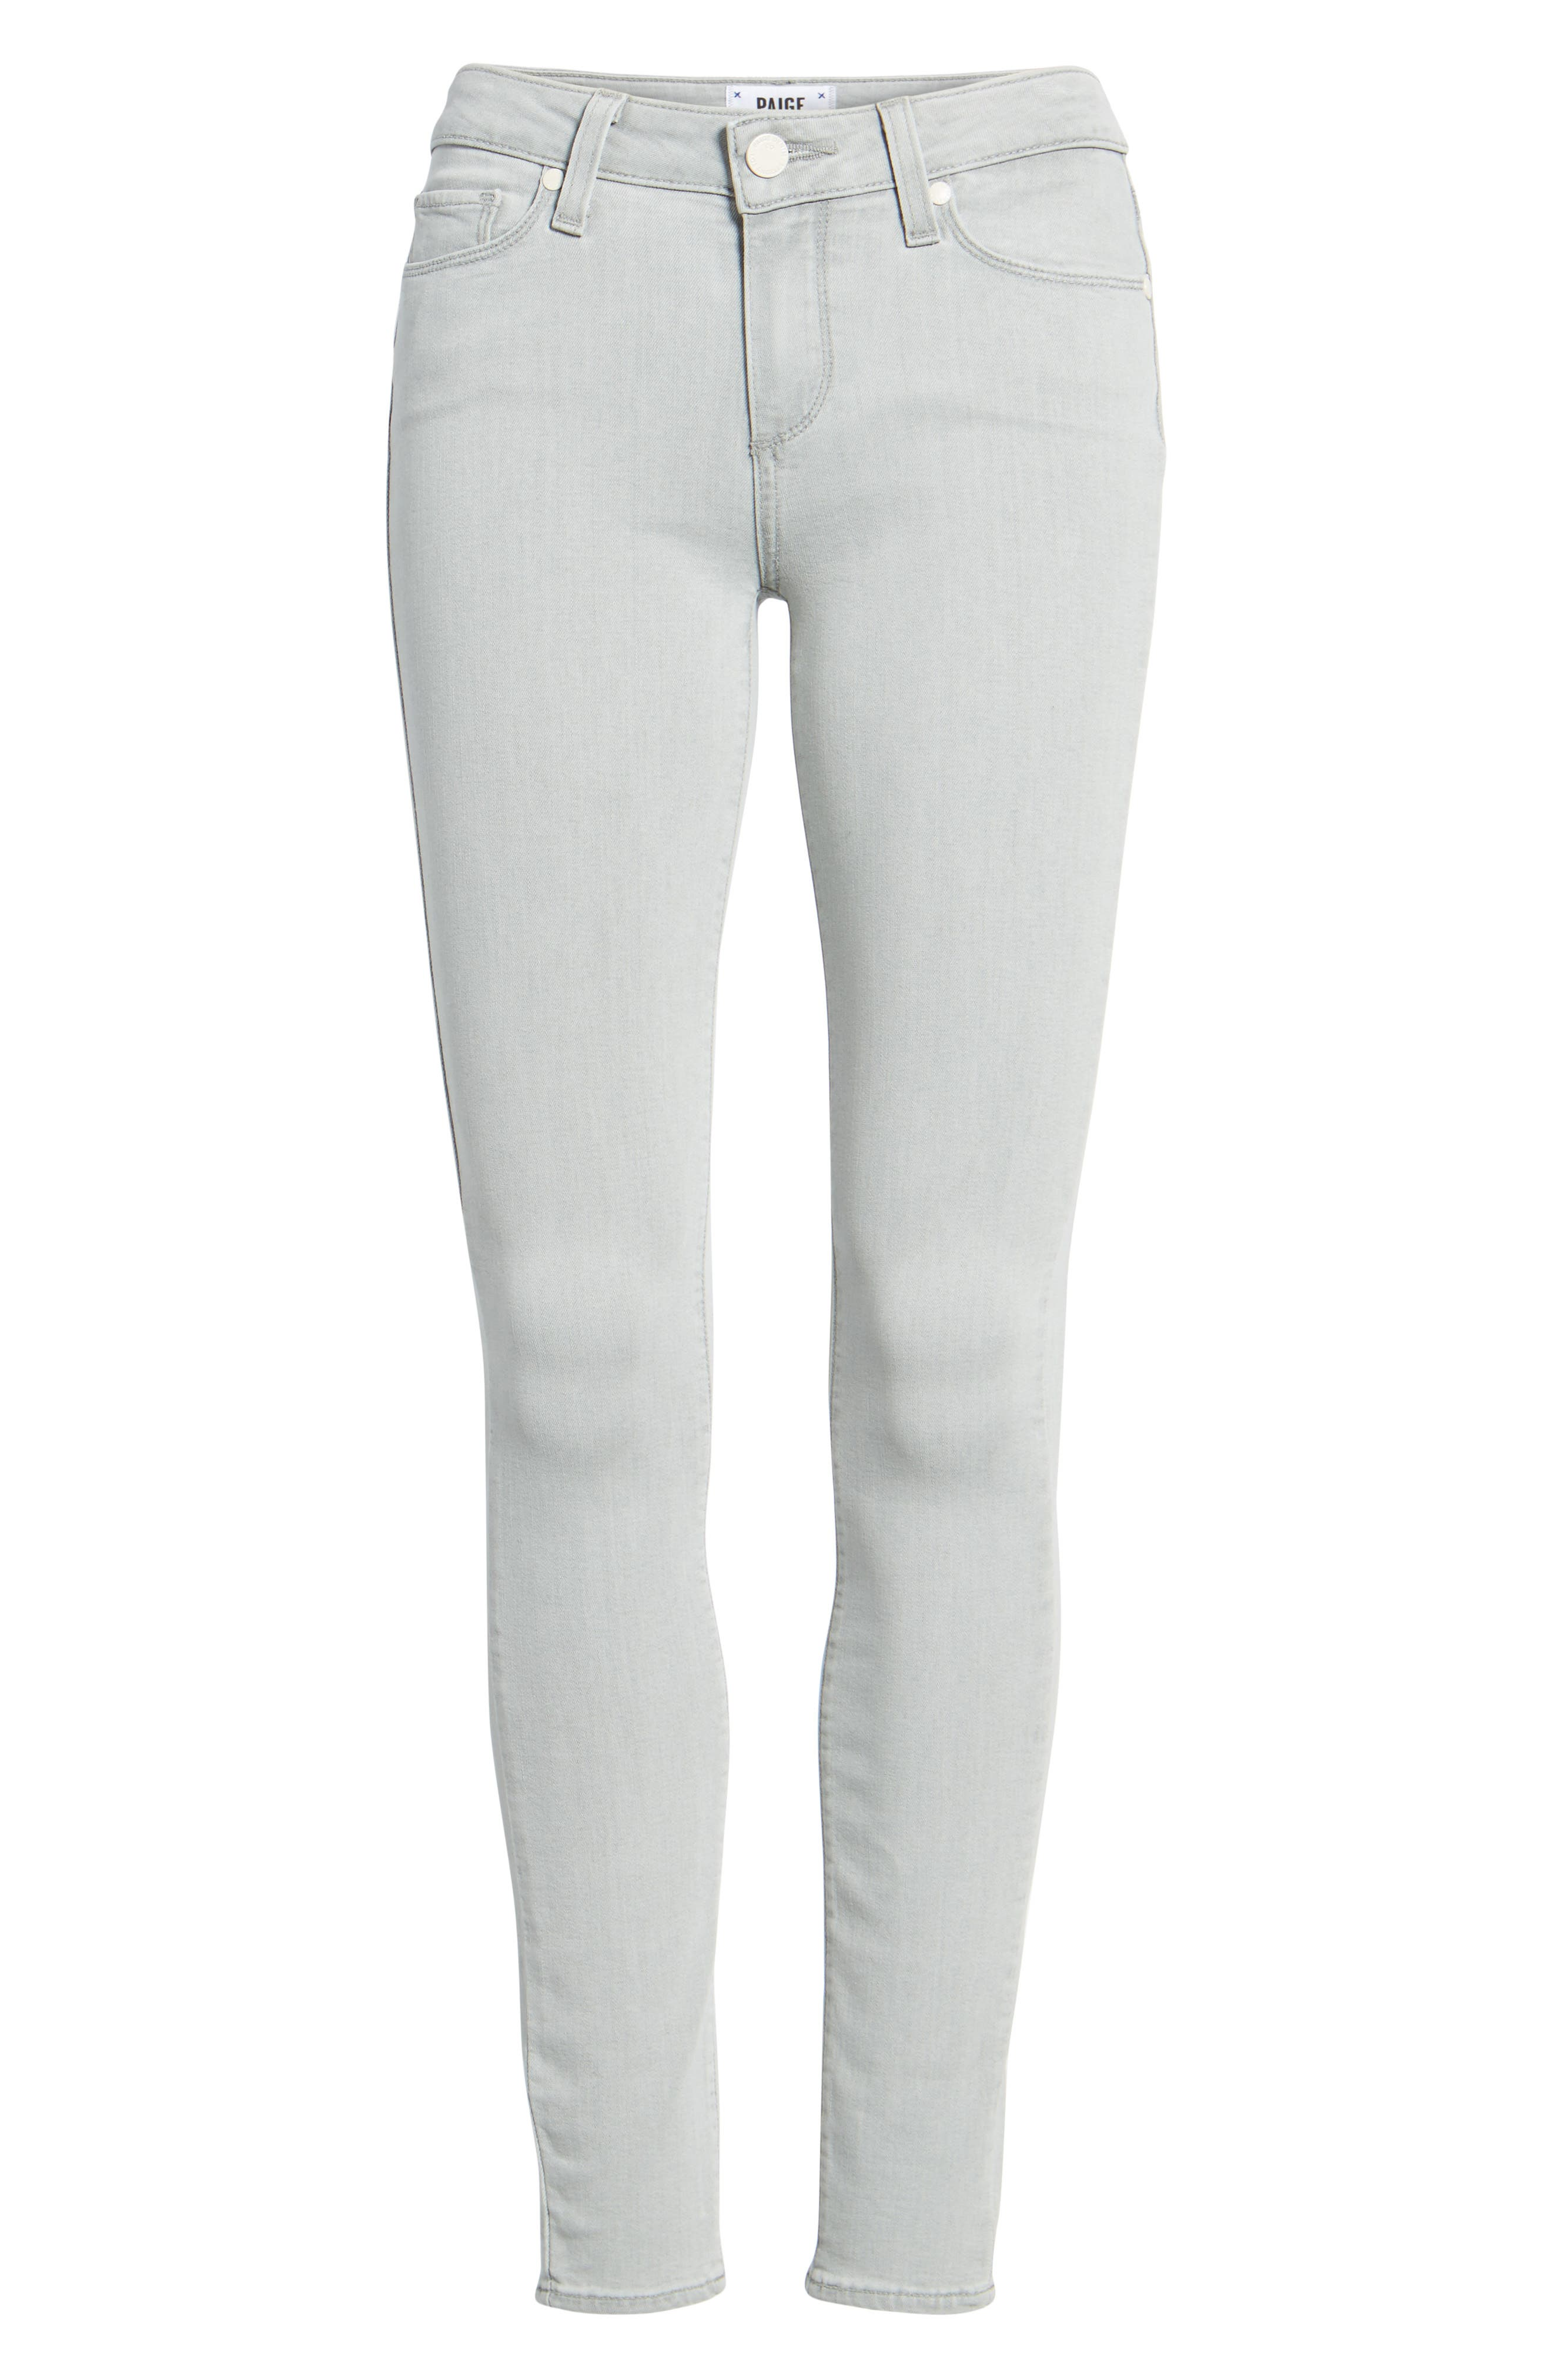 Transcend - Verdugo Ultra Skinny Jeans,                             Alternate thumbnail 7, color,